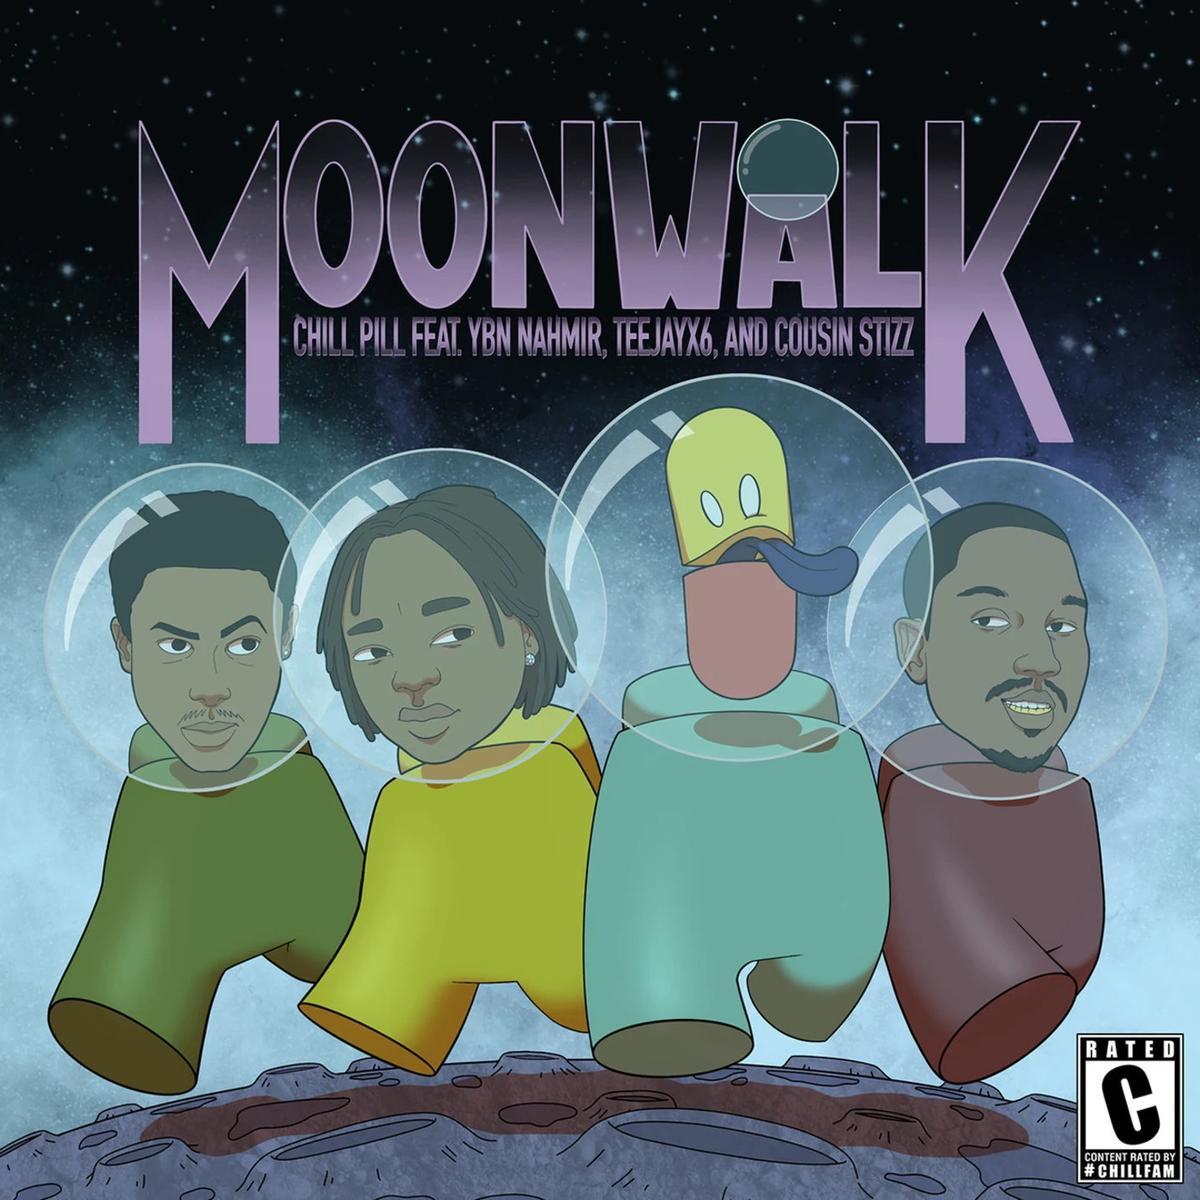 MP3: ChillPill - Moonwalk Ft. YBN Nahmir, Teejayx6 & Cousin Stizz